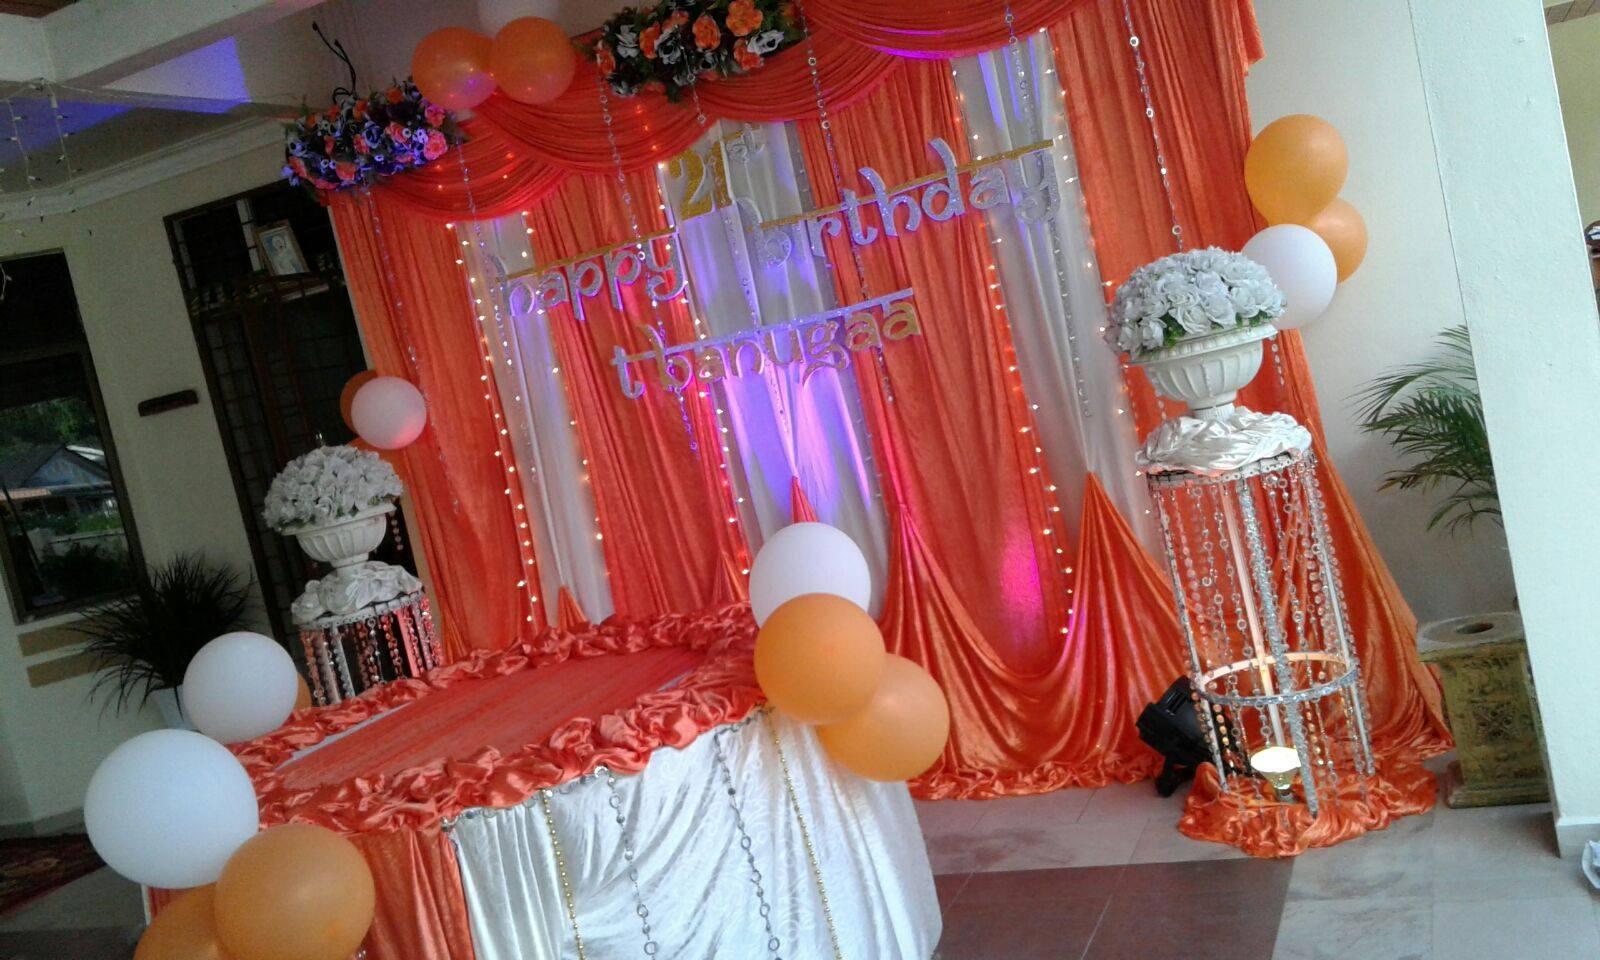 Kisha mega events 21st birthday decoration orange white for 21st birthday decoration ideas